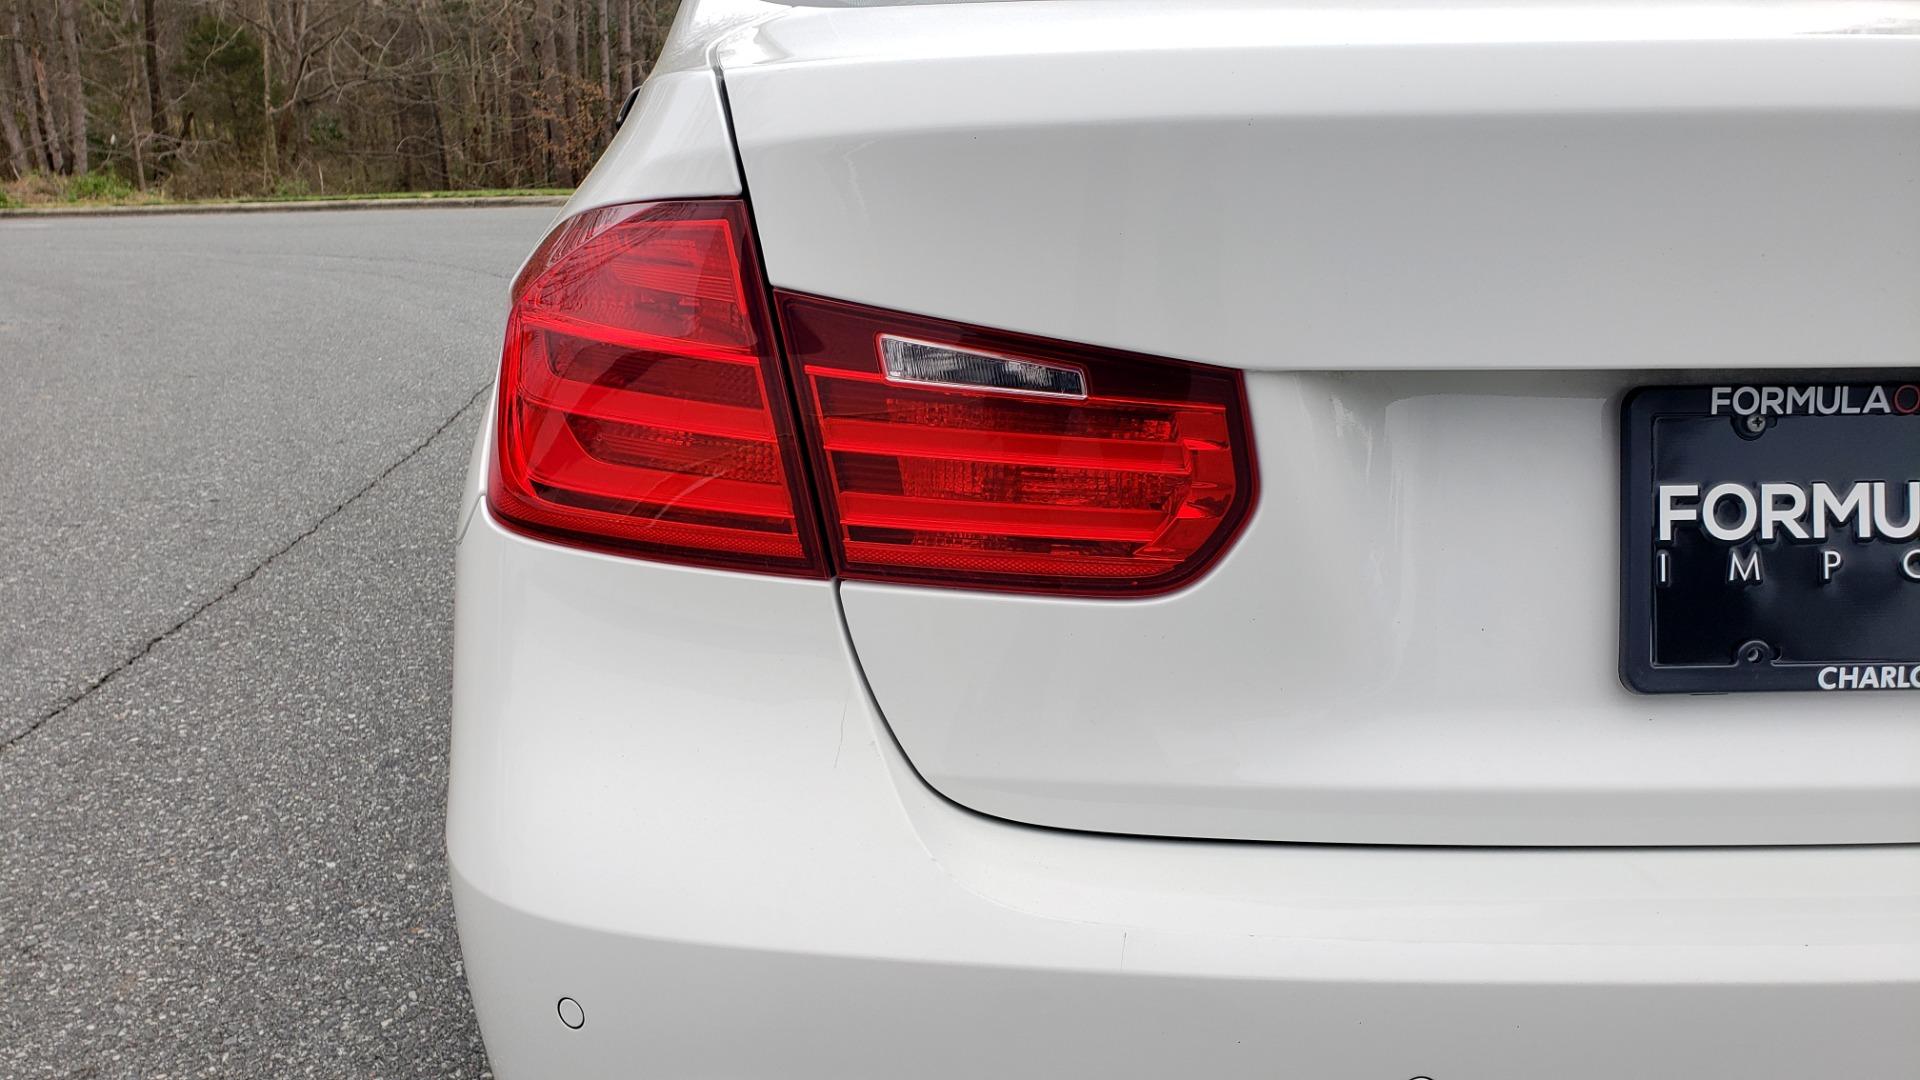 Used 2015 BMW 3 Series 335I M-SPORT / PREM PKG / HK SND / SUNROOF / REARVIEW for sale Sold at Formula Imports in Charlotte NC 28227 29